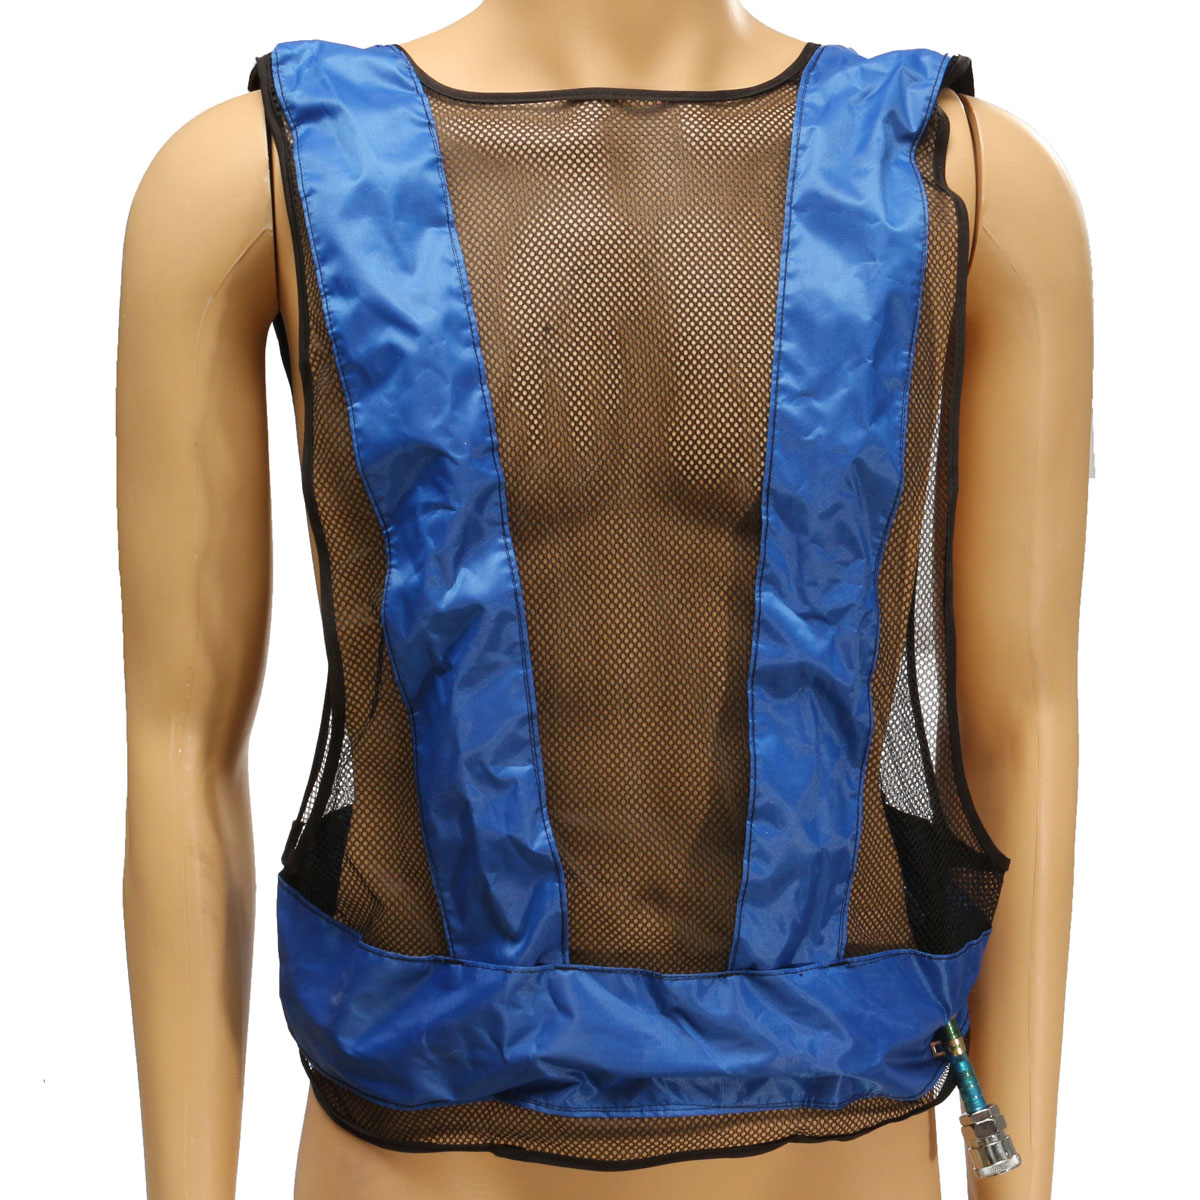 Air Cooling Vest : Vortex tube air conditioner waistcoat compressed